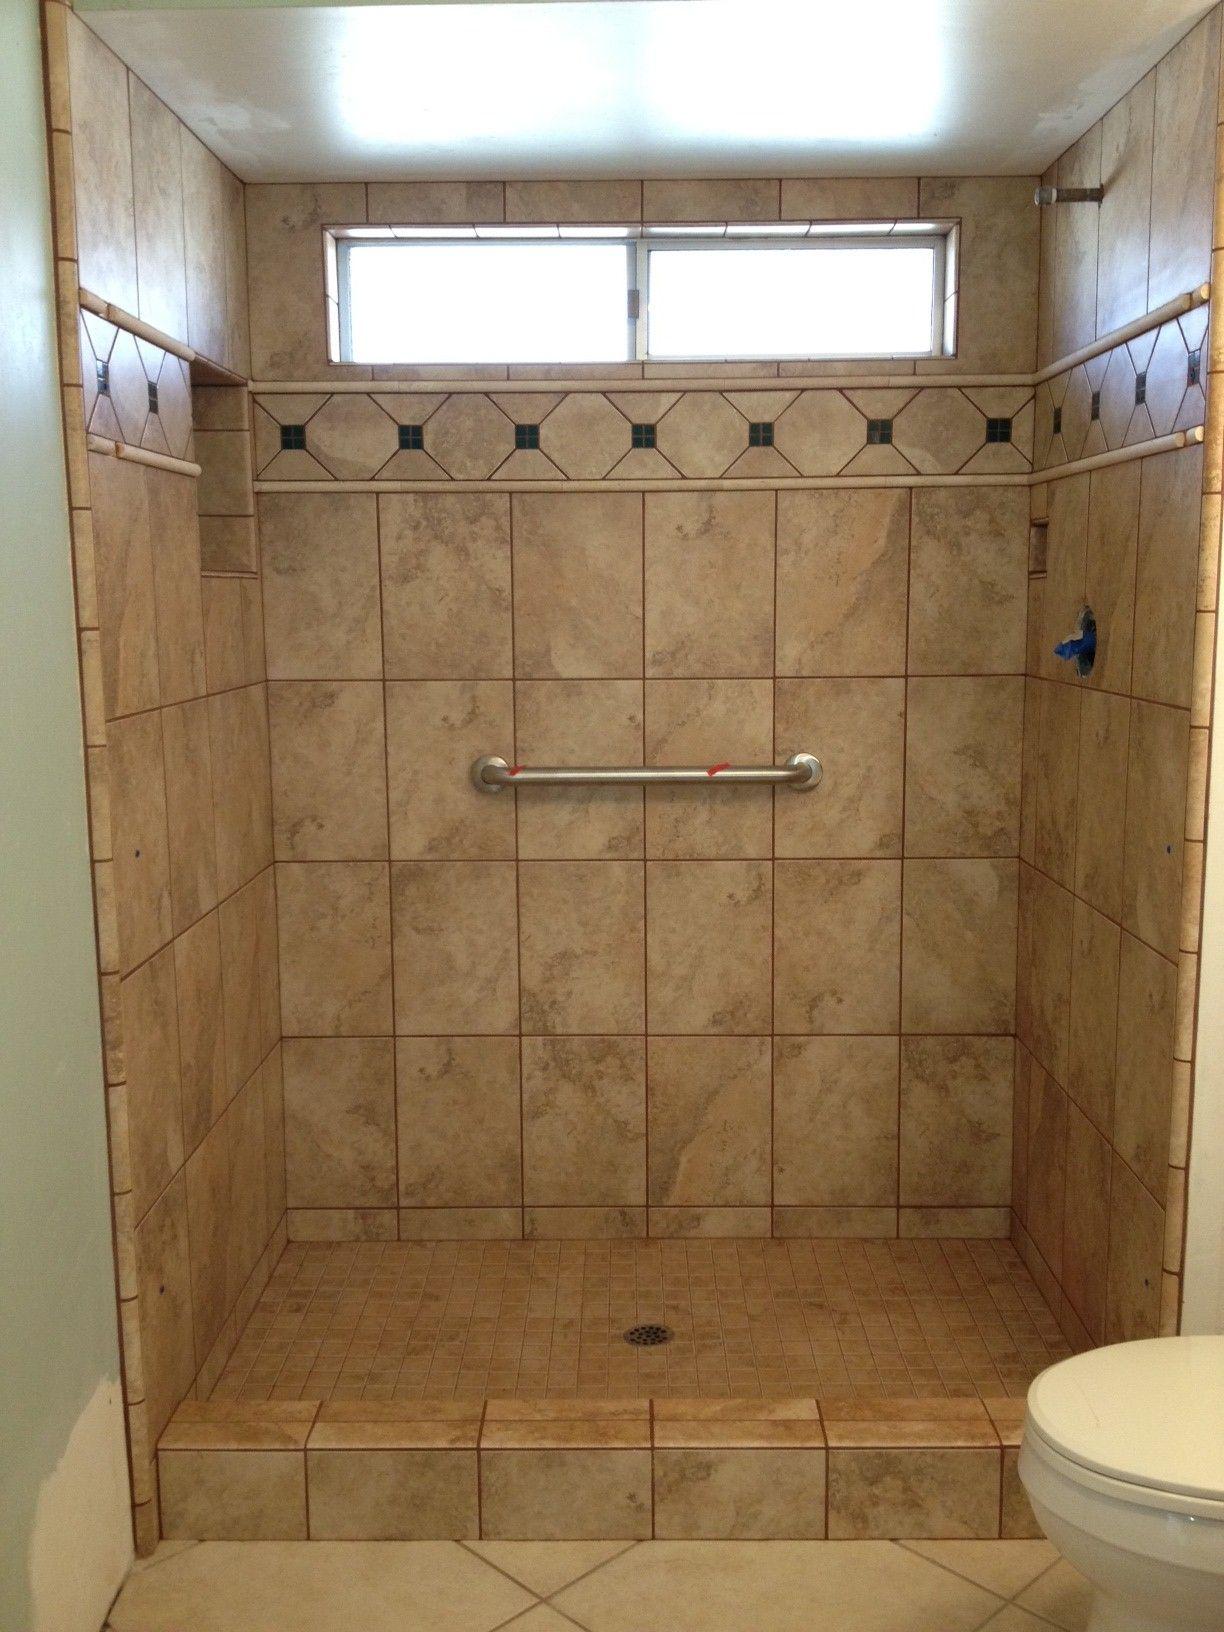 photos of tiled shower stalls